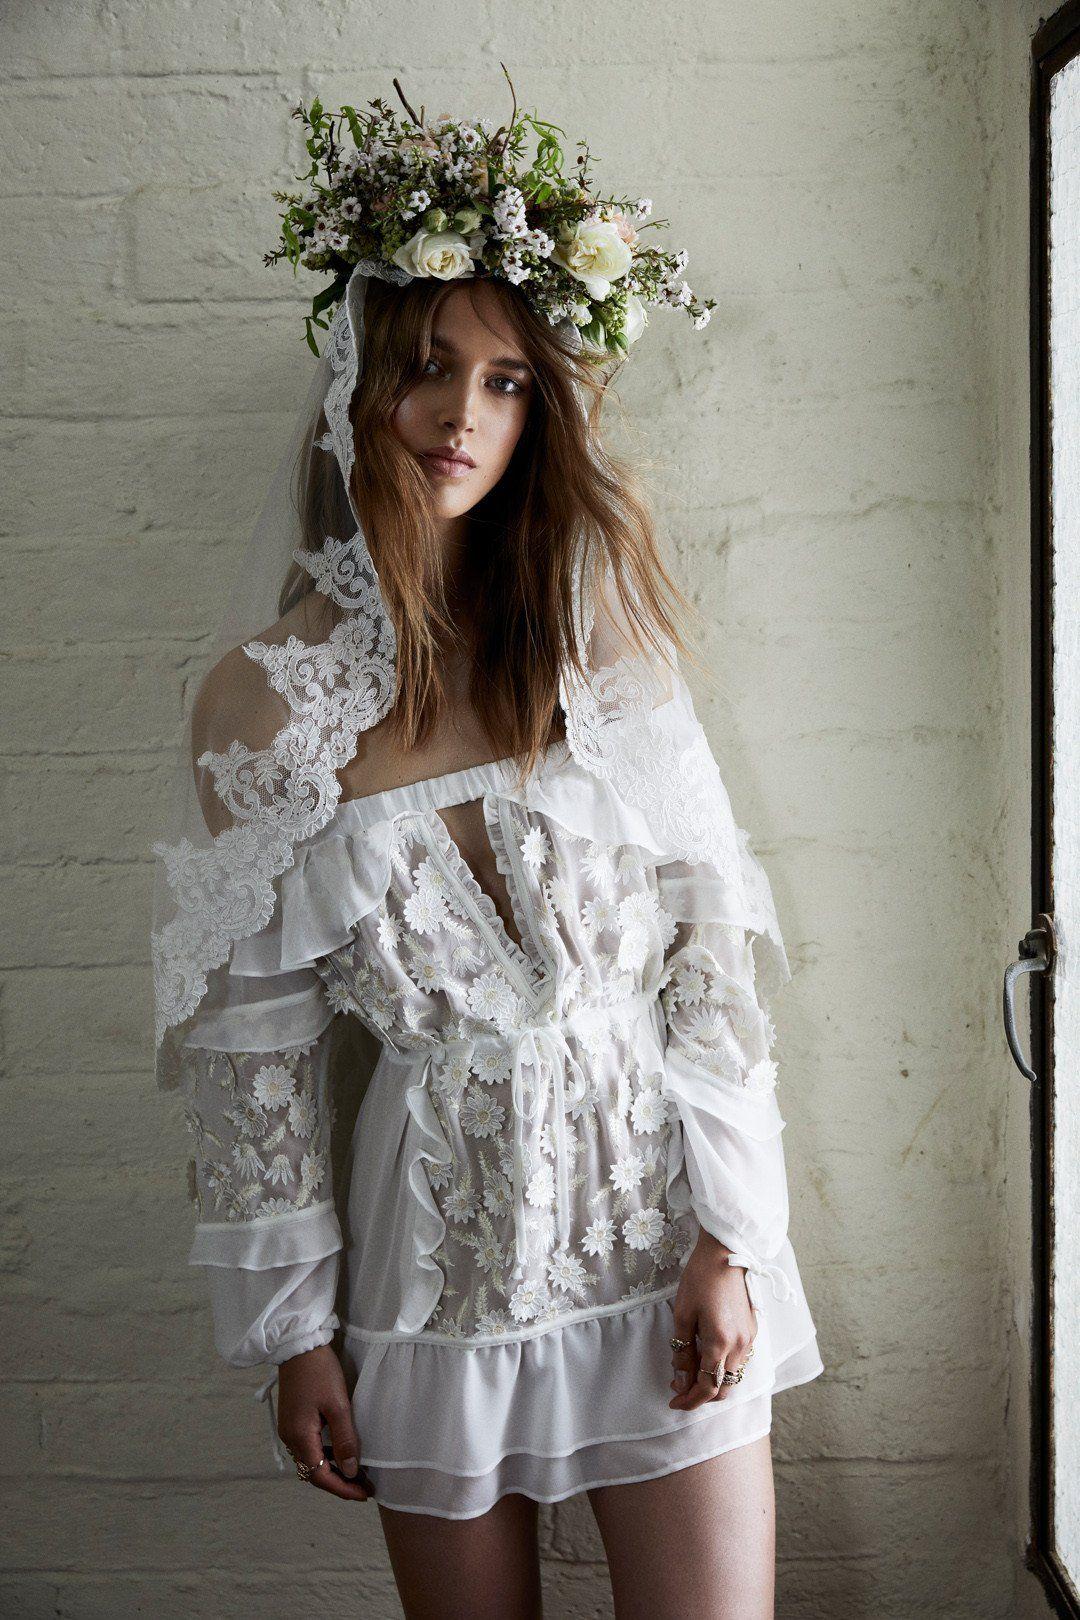 Affordable bohemian wedding dresses  CAROLINA OFF THE SHOULDER DRESS  Nice Day for a White Wedding